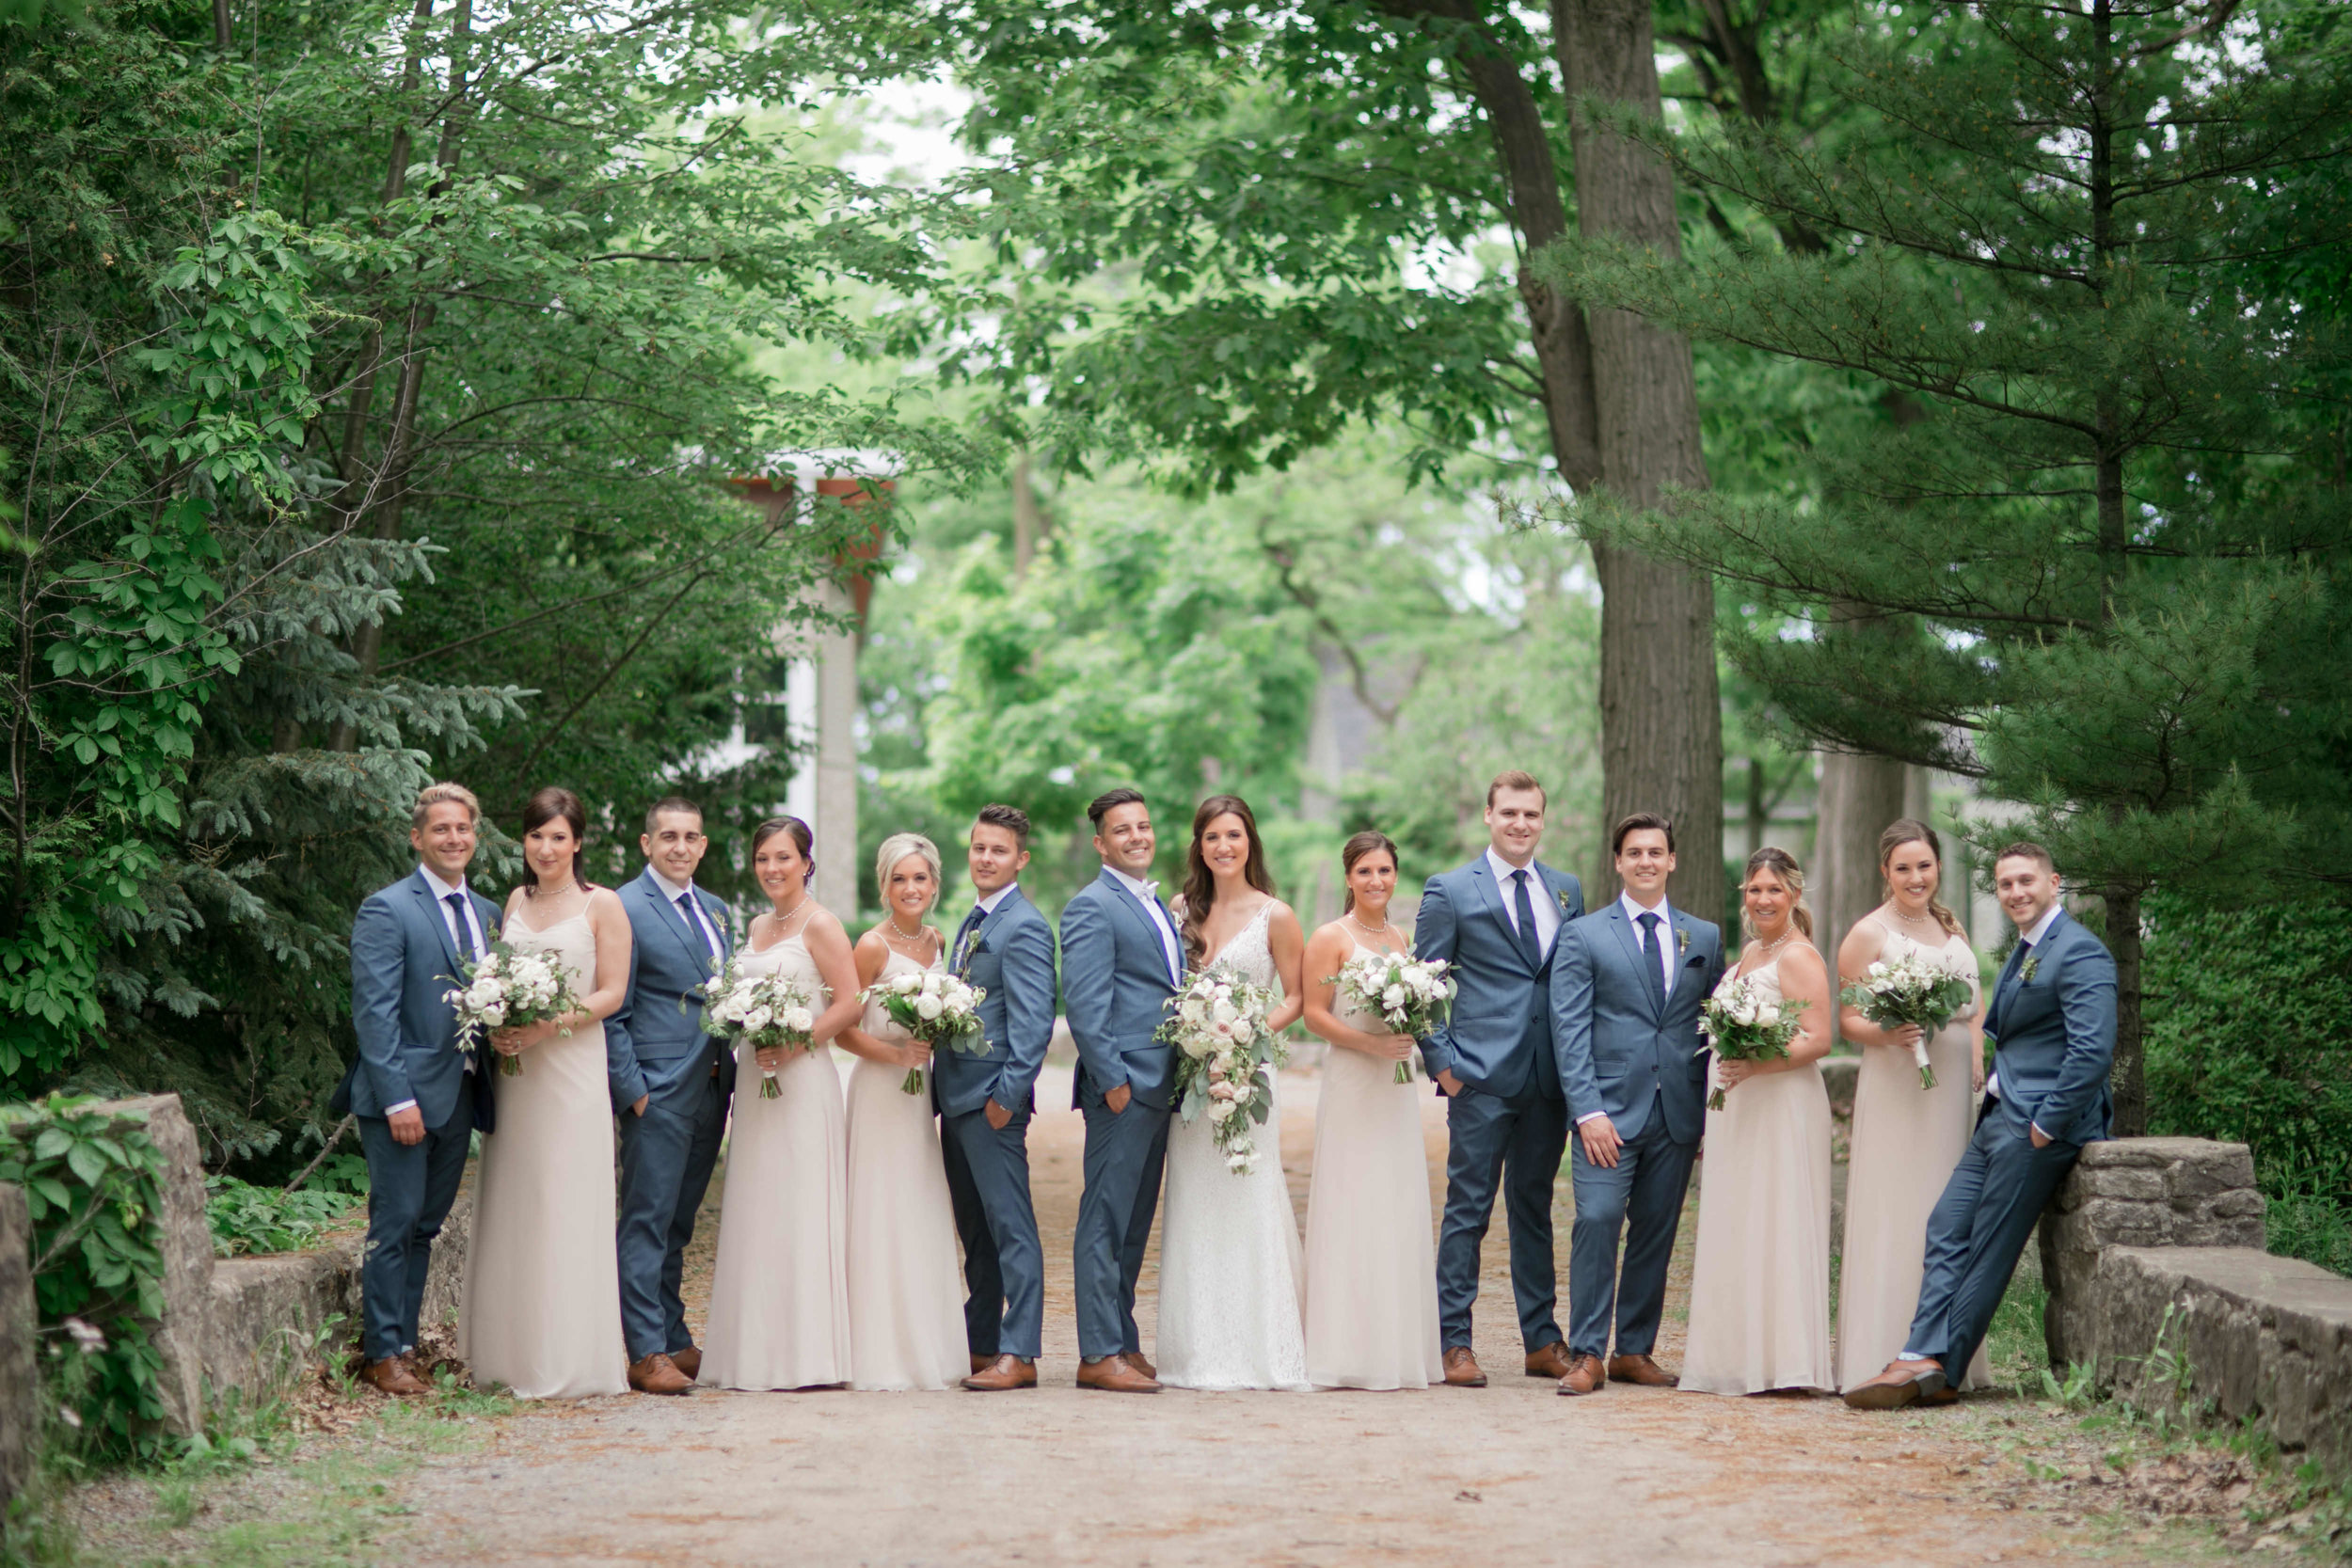 Miranda___Daniel___Daniel_Ricci_Weddings___High_Res._Finals_404.jpg